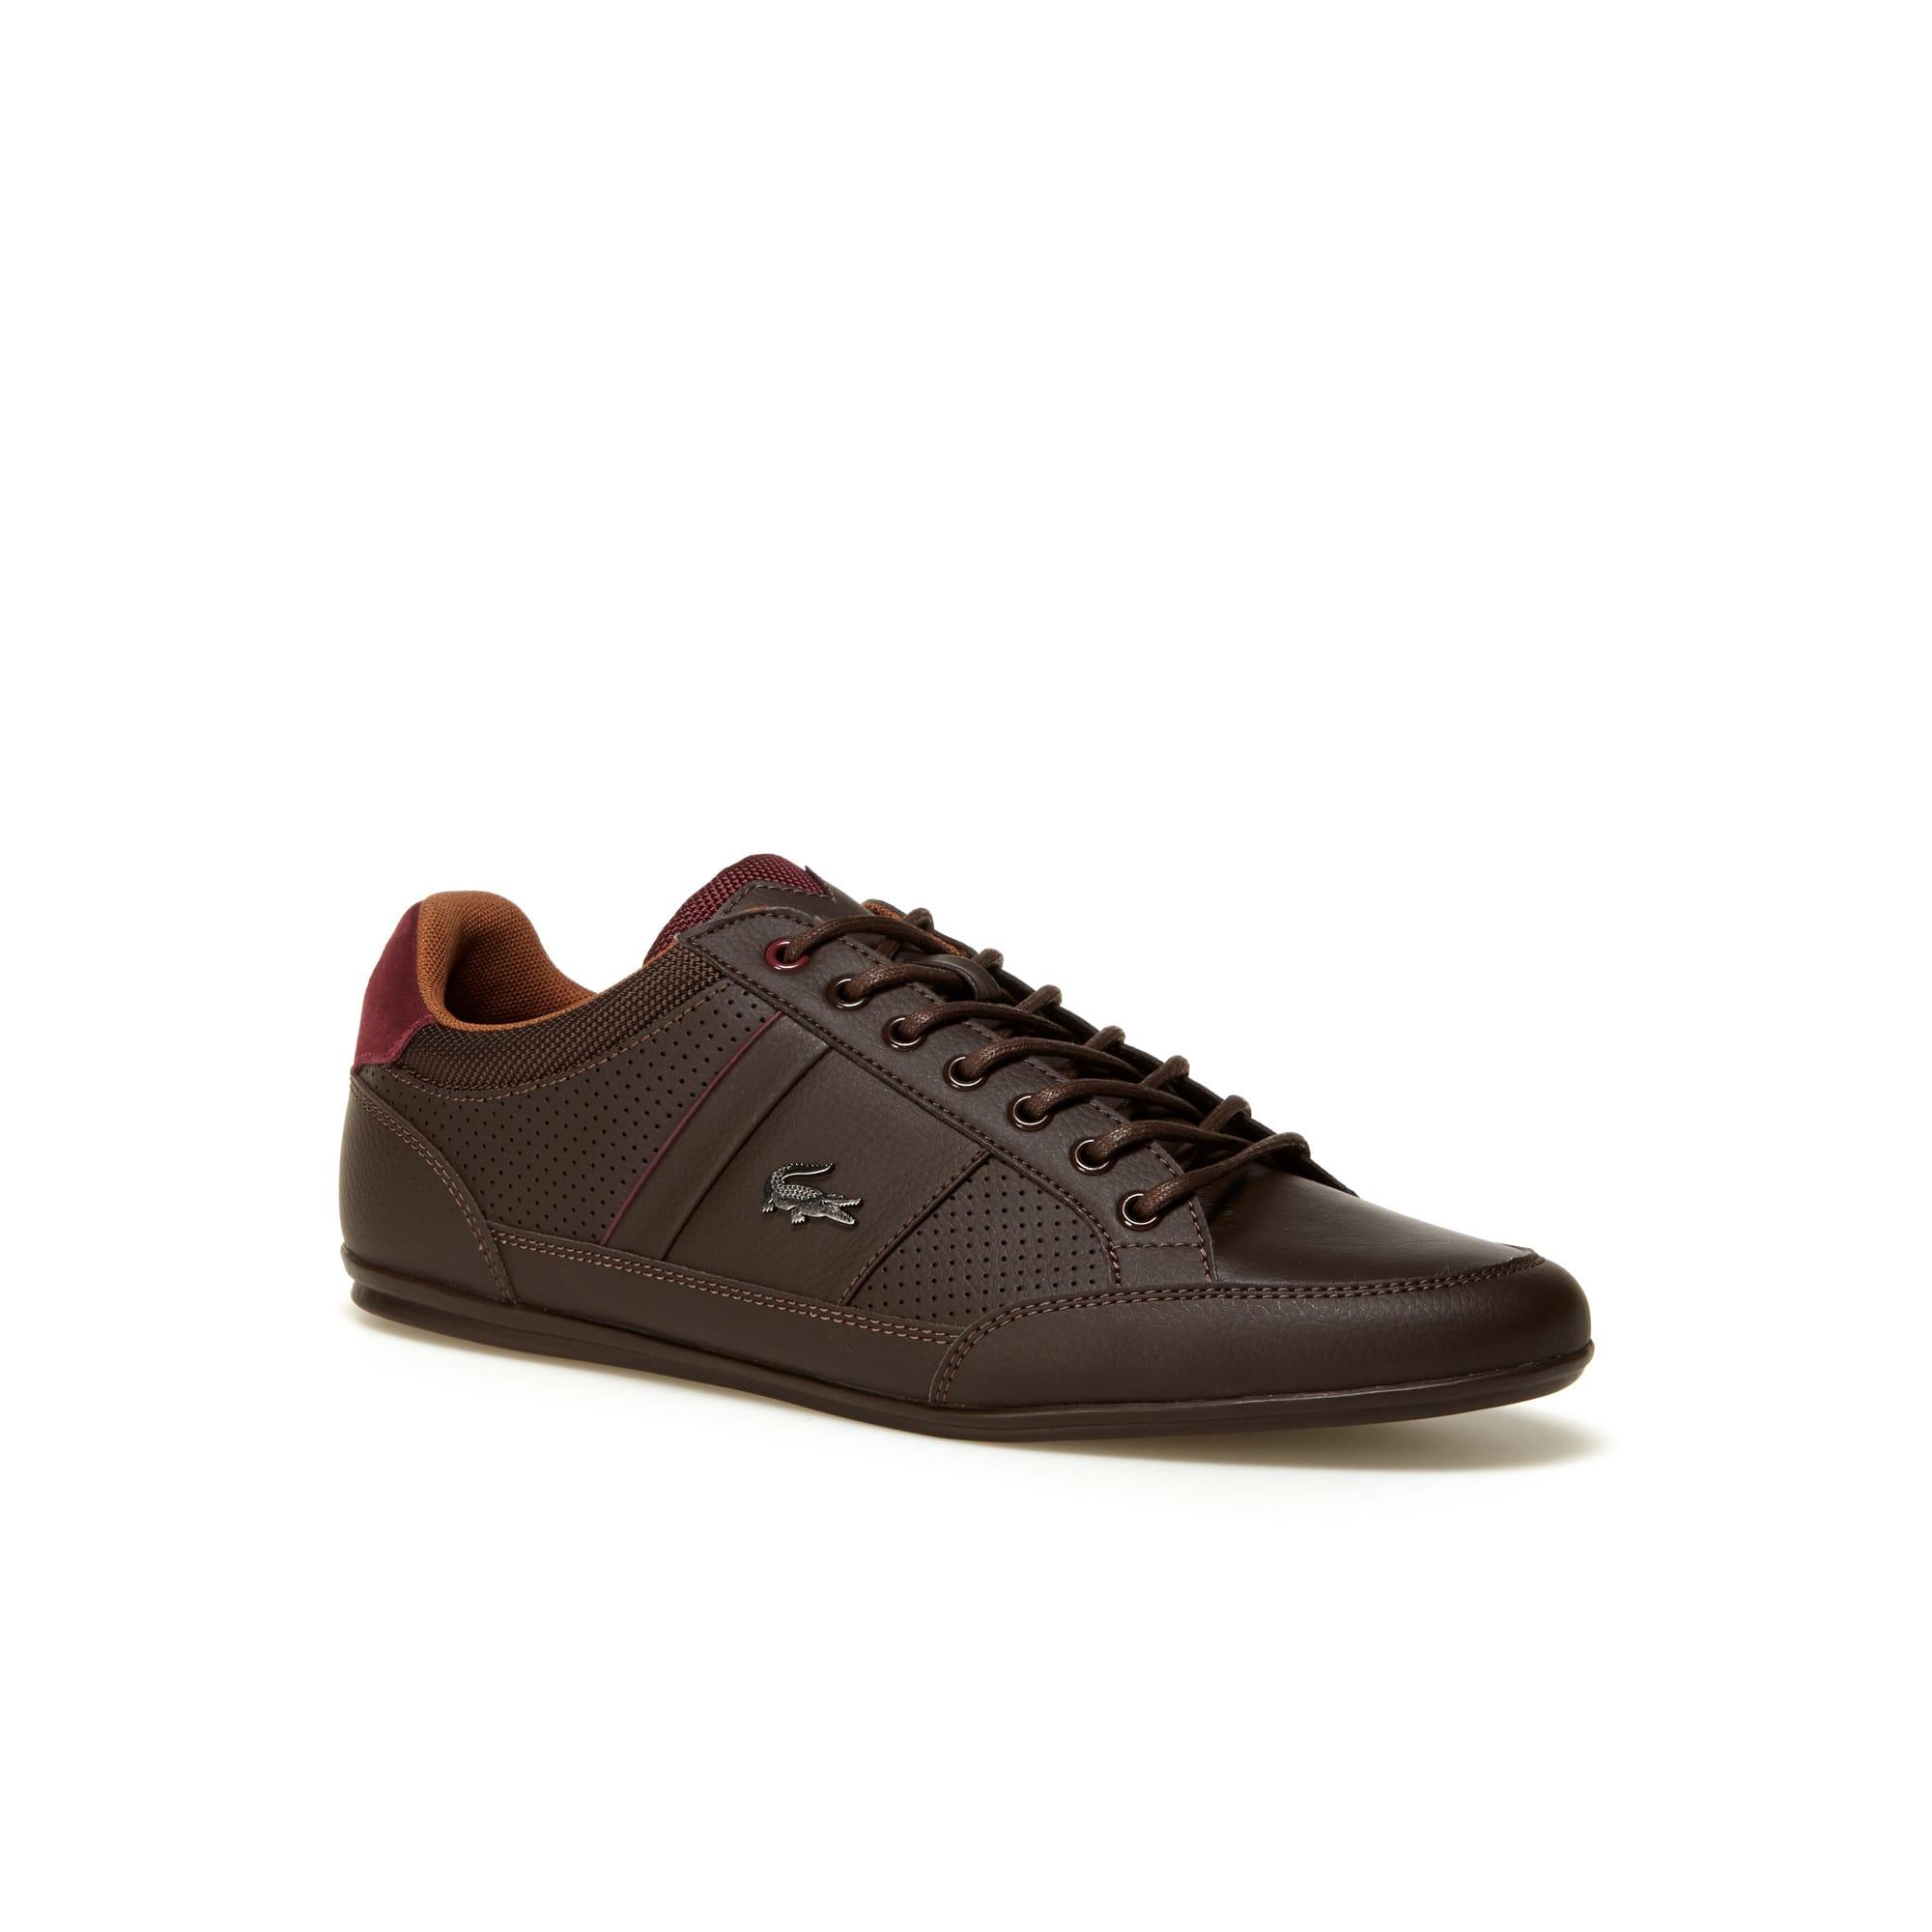 Chaussures De Sport En Cuir lf4bDl